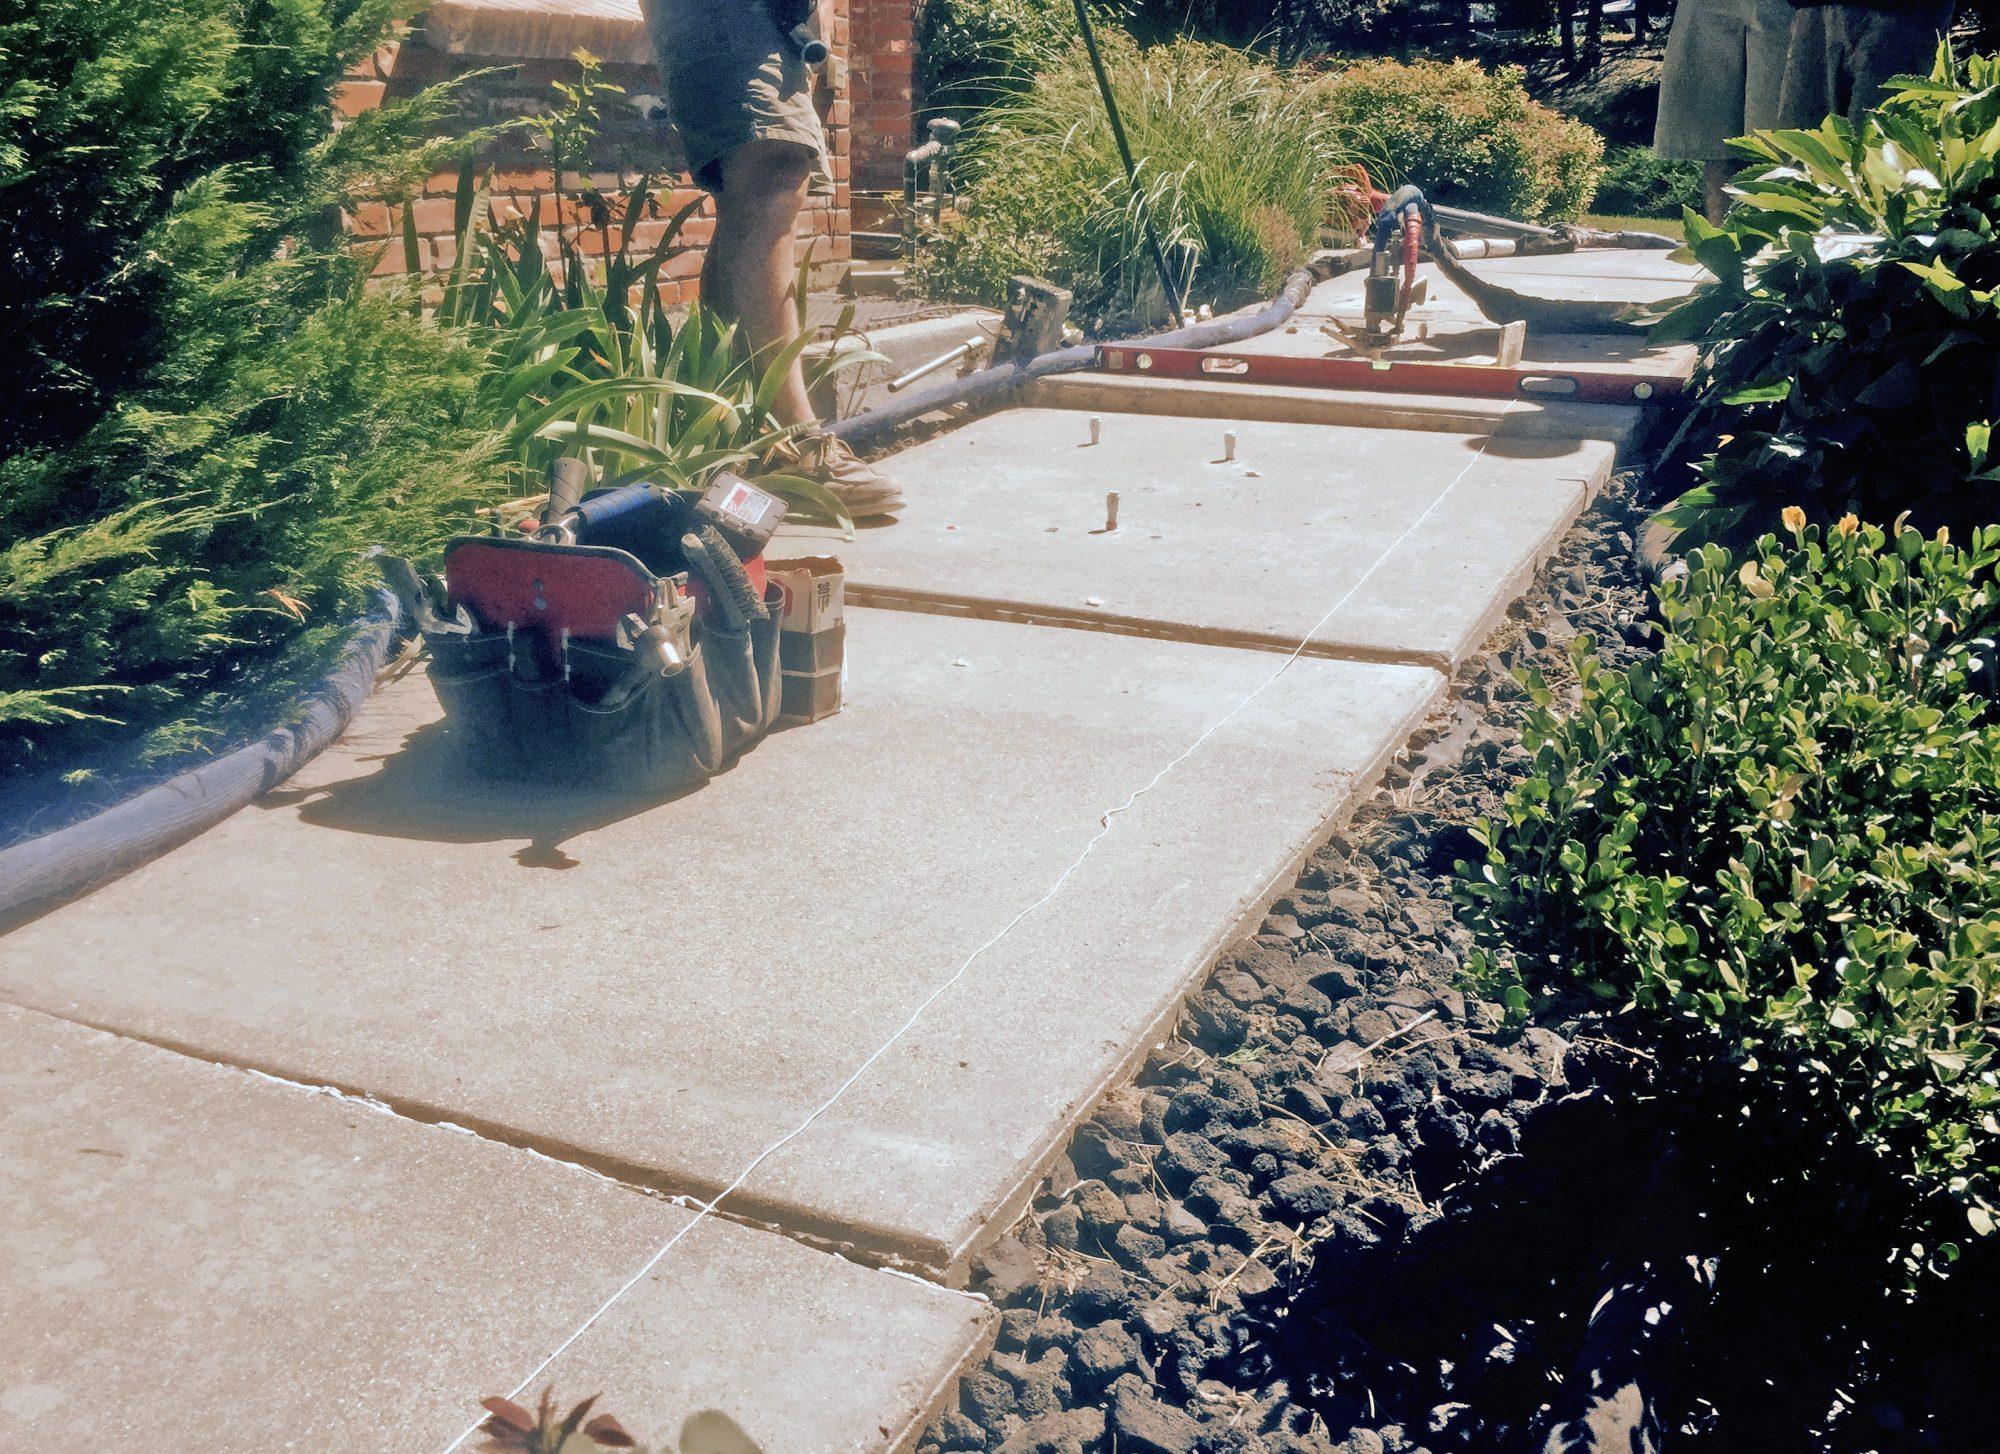 Walkway repair in progress from Liftech